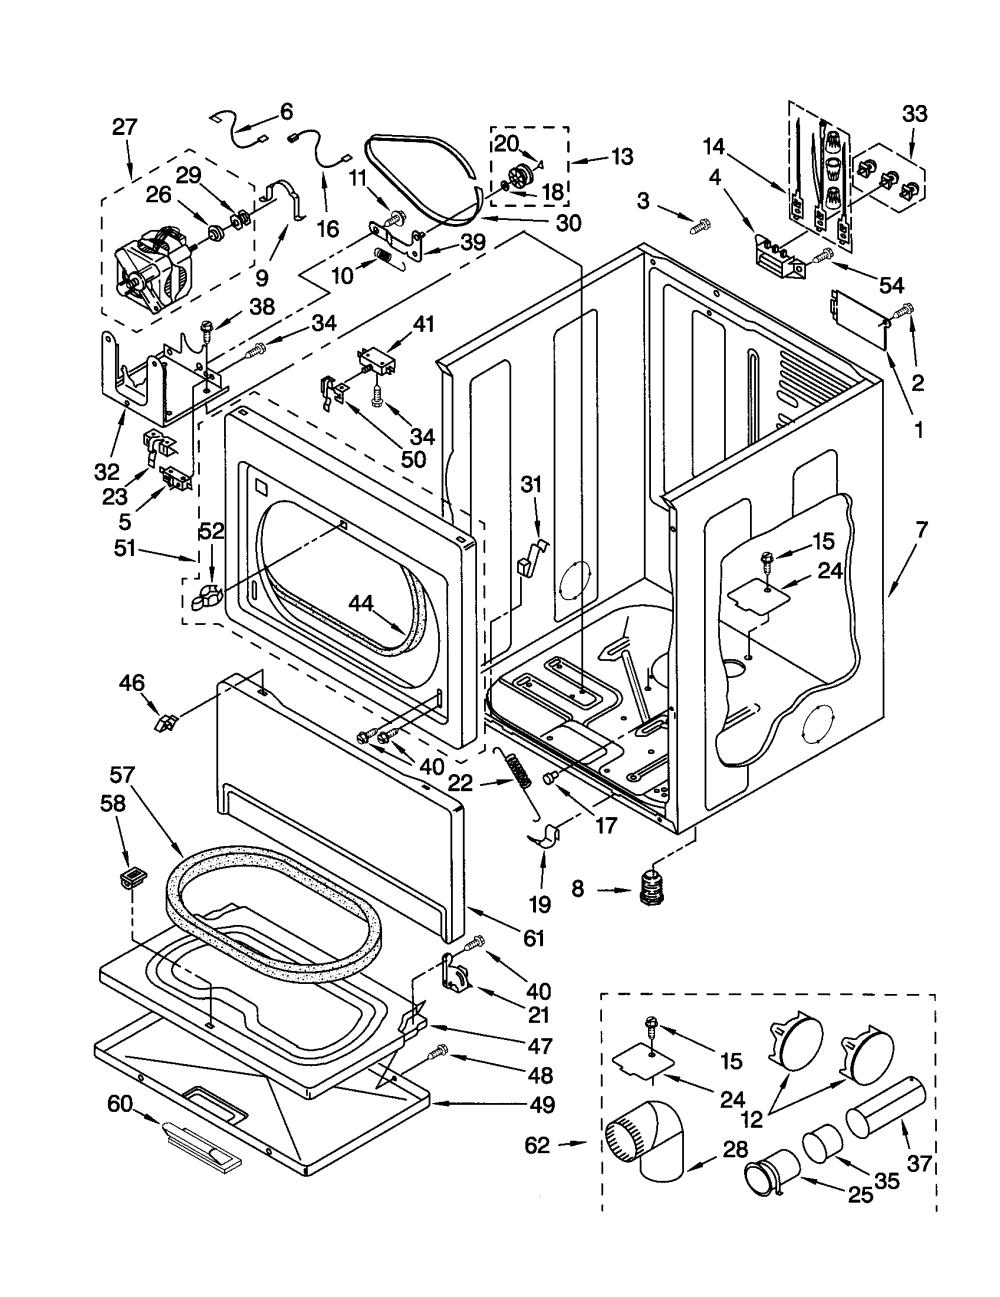 medium resolution of kenmore model 11062912100 residential dryer genuine parts clothes dryer diagram kenmore dryer diagram source sears dryer diagram wiring